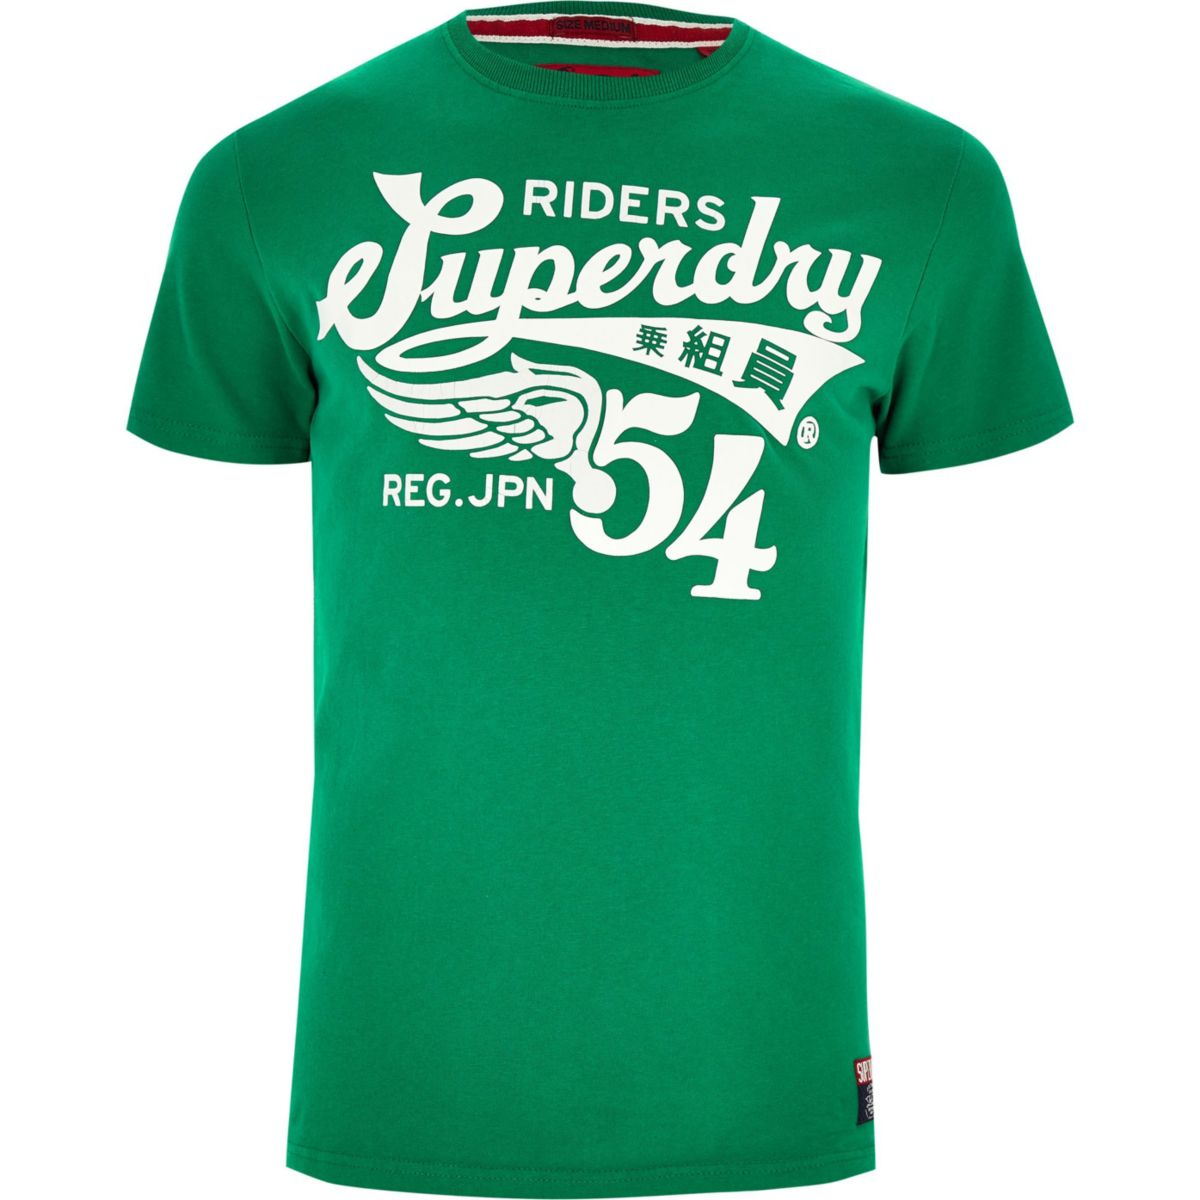 shirt crew logo T Superdry print green neck q7TxPSw